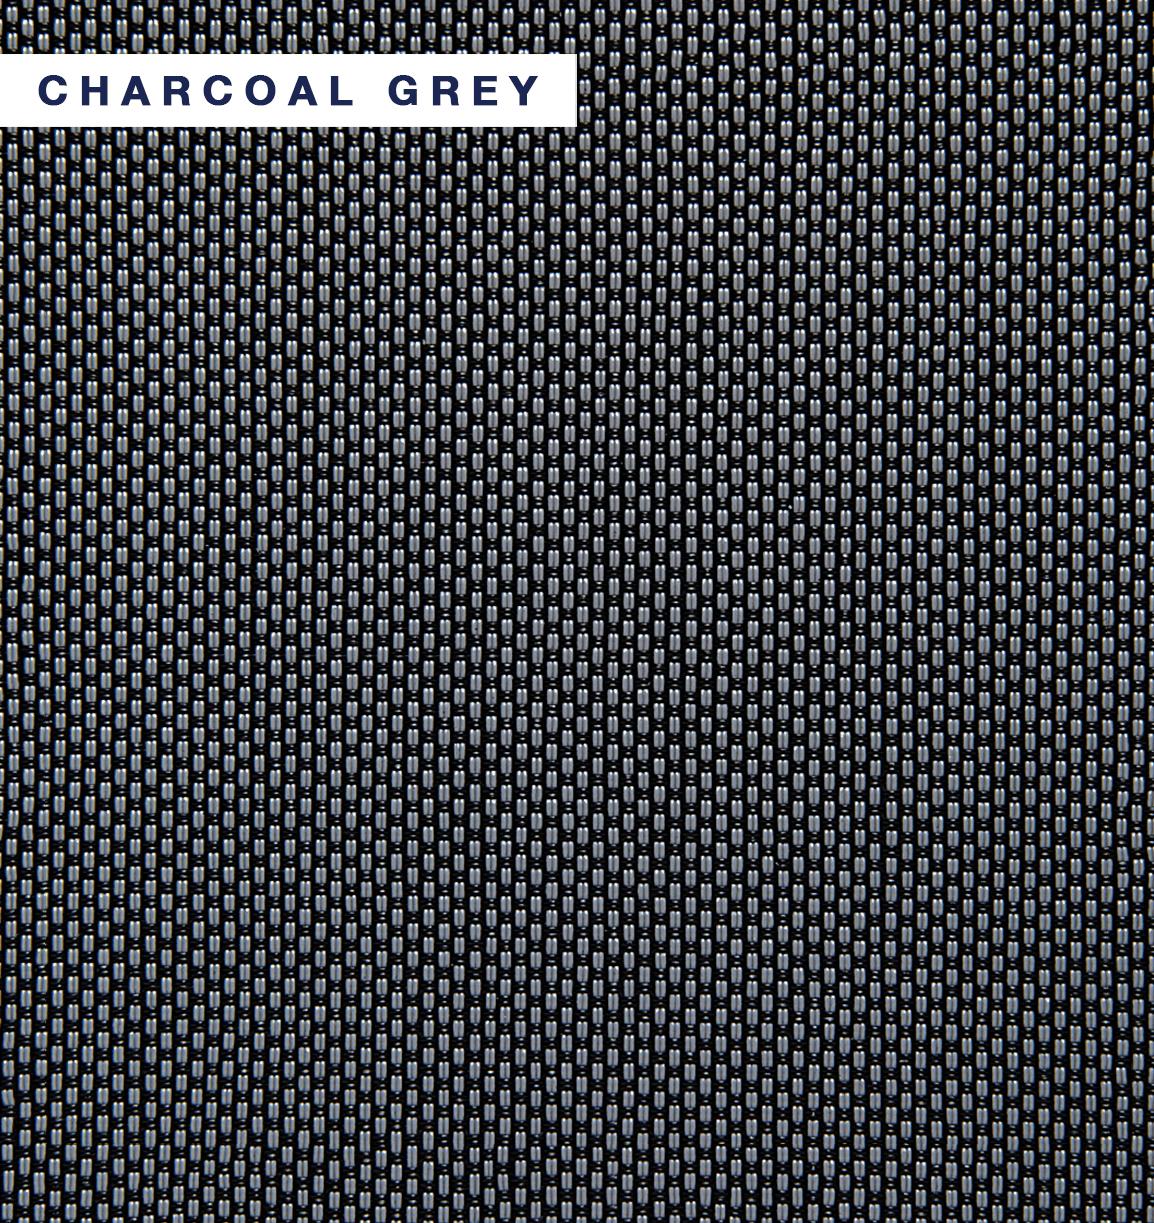 SW4510 - Charcoal Grey.jpg